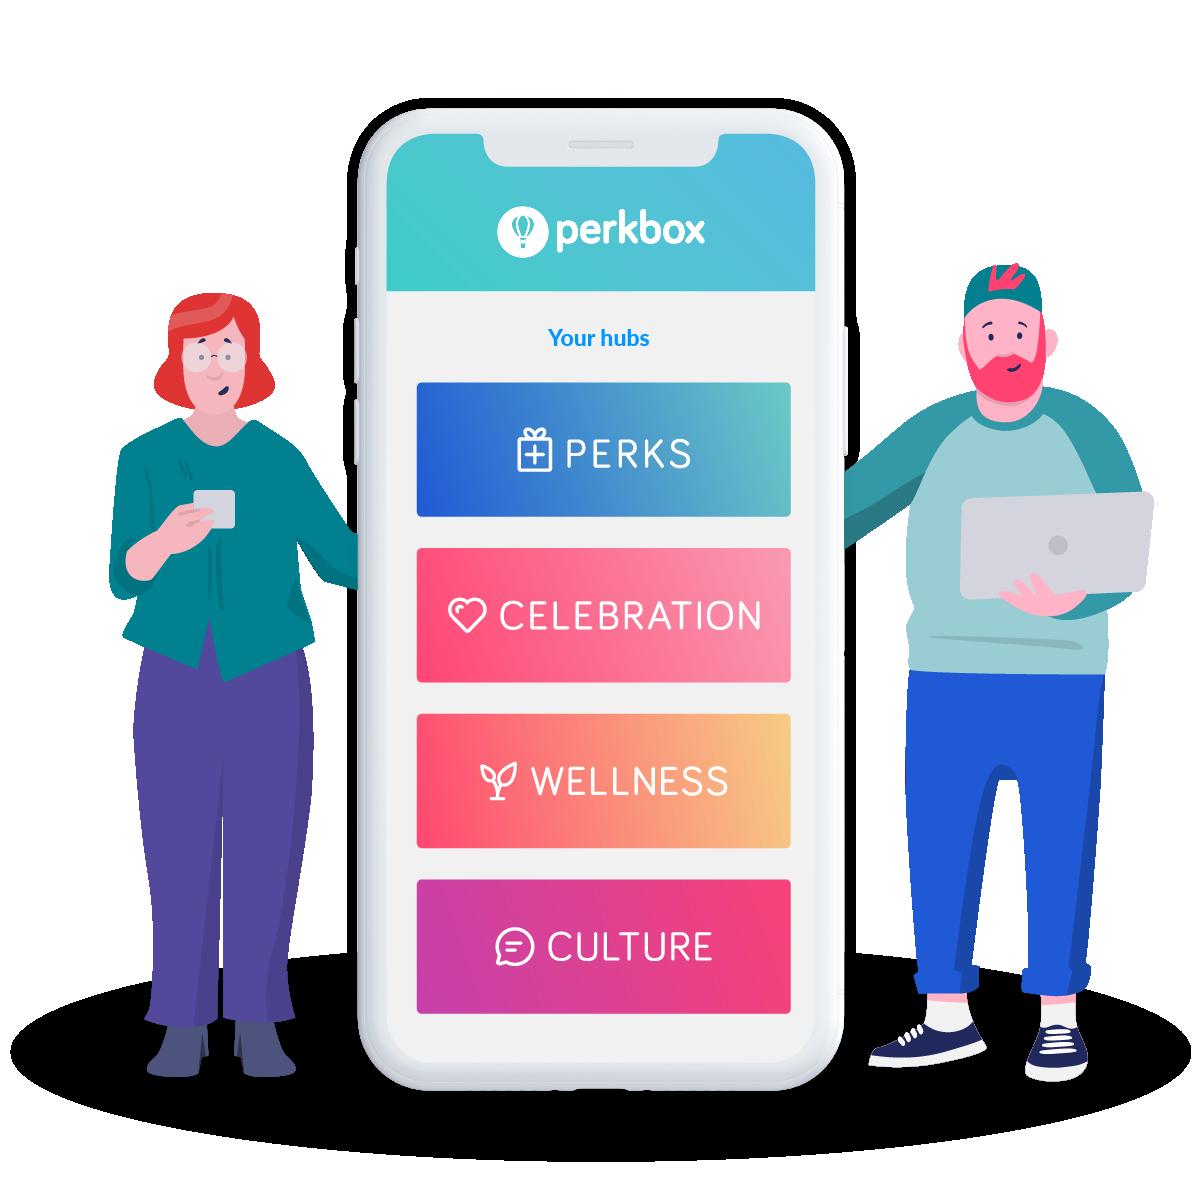 harmonisation with perkbox